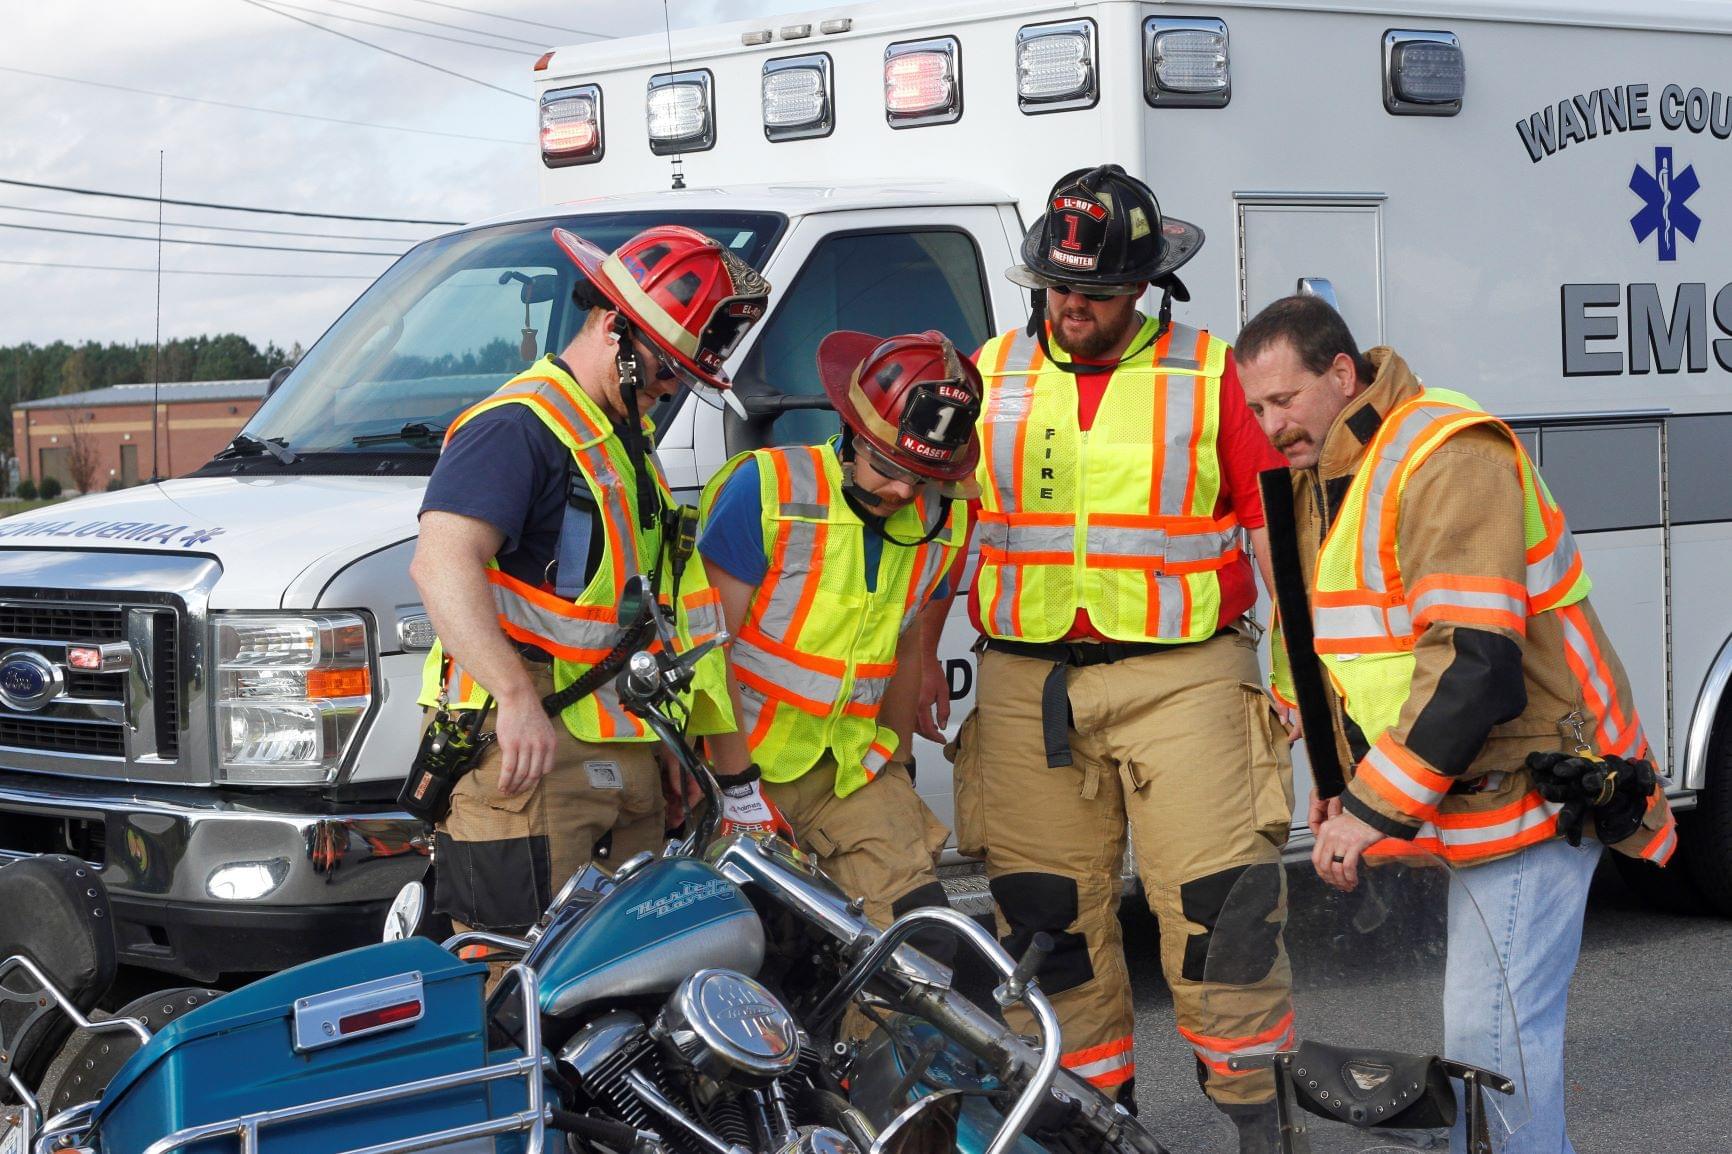 Motorcyclist Hospitalized Following Crash (PHOTOS)